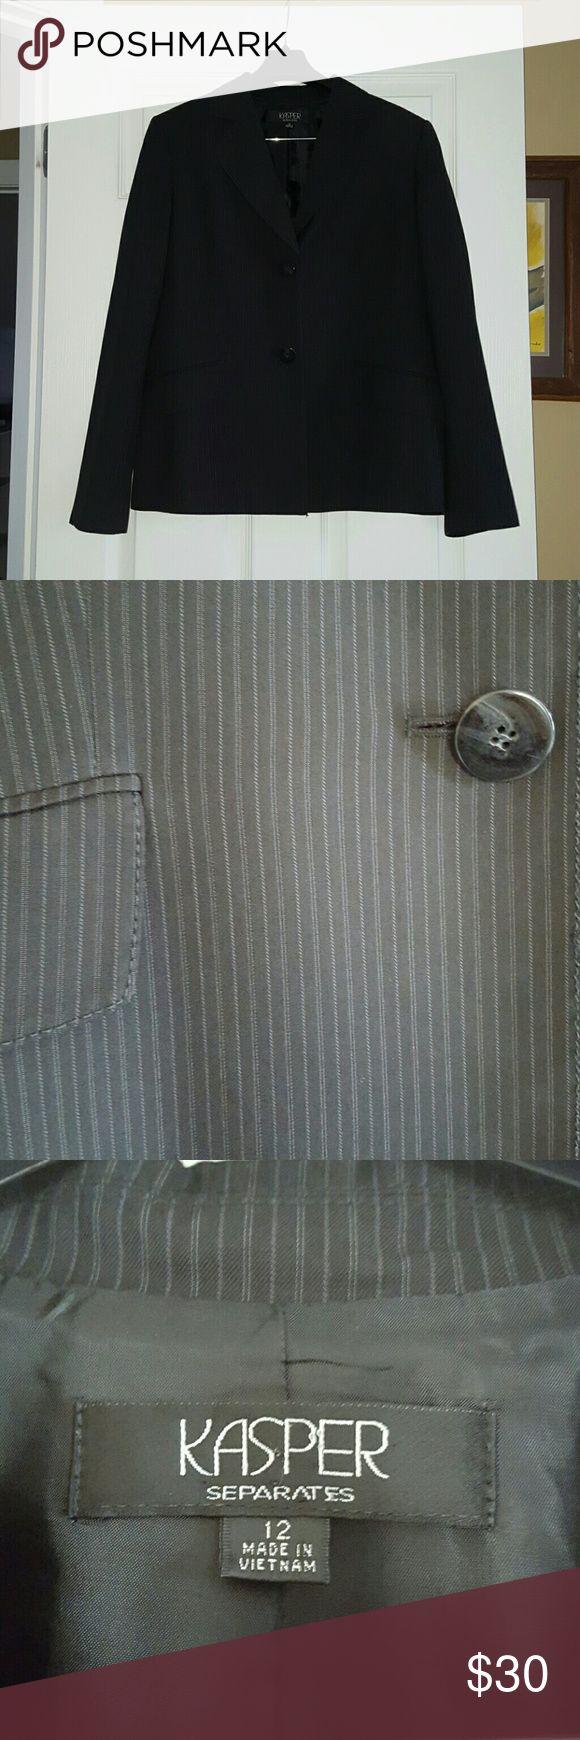 Kasper Women's Pant Suit. Size 12 Kasper Women's Pant Suit. Size 12. Black with grey stripes. Used but in good condition.  Smoke free/cat free home. Kasper Jackets & Coats Blazers